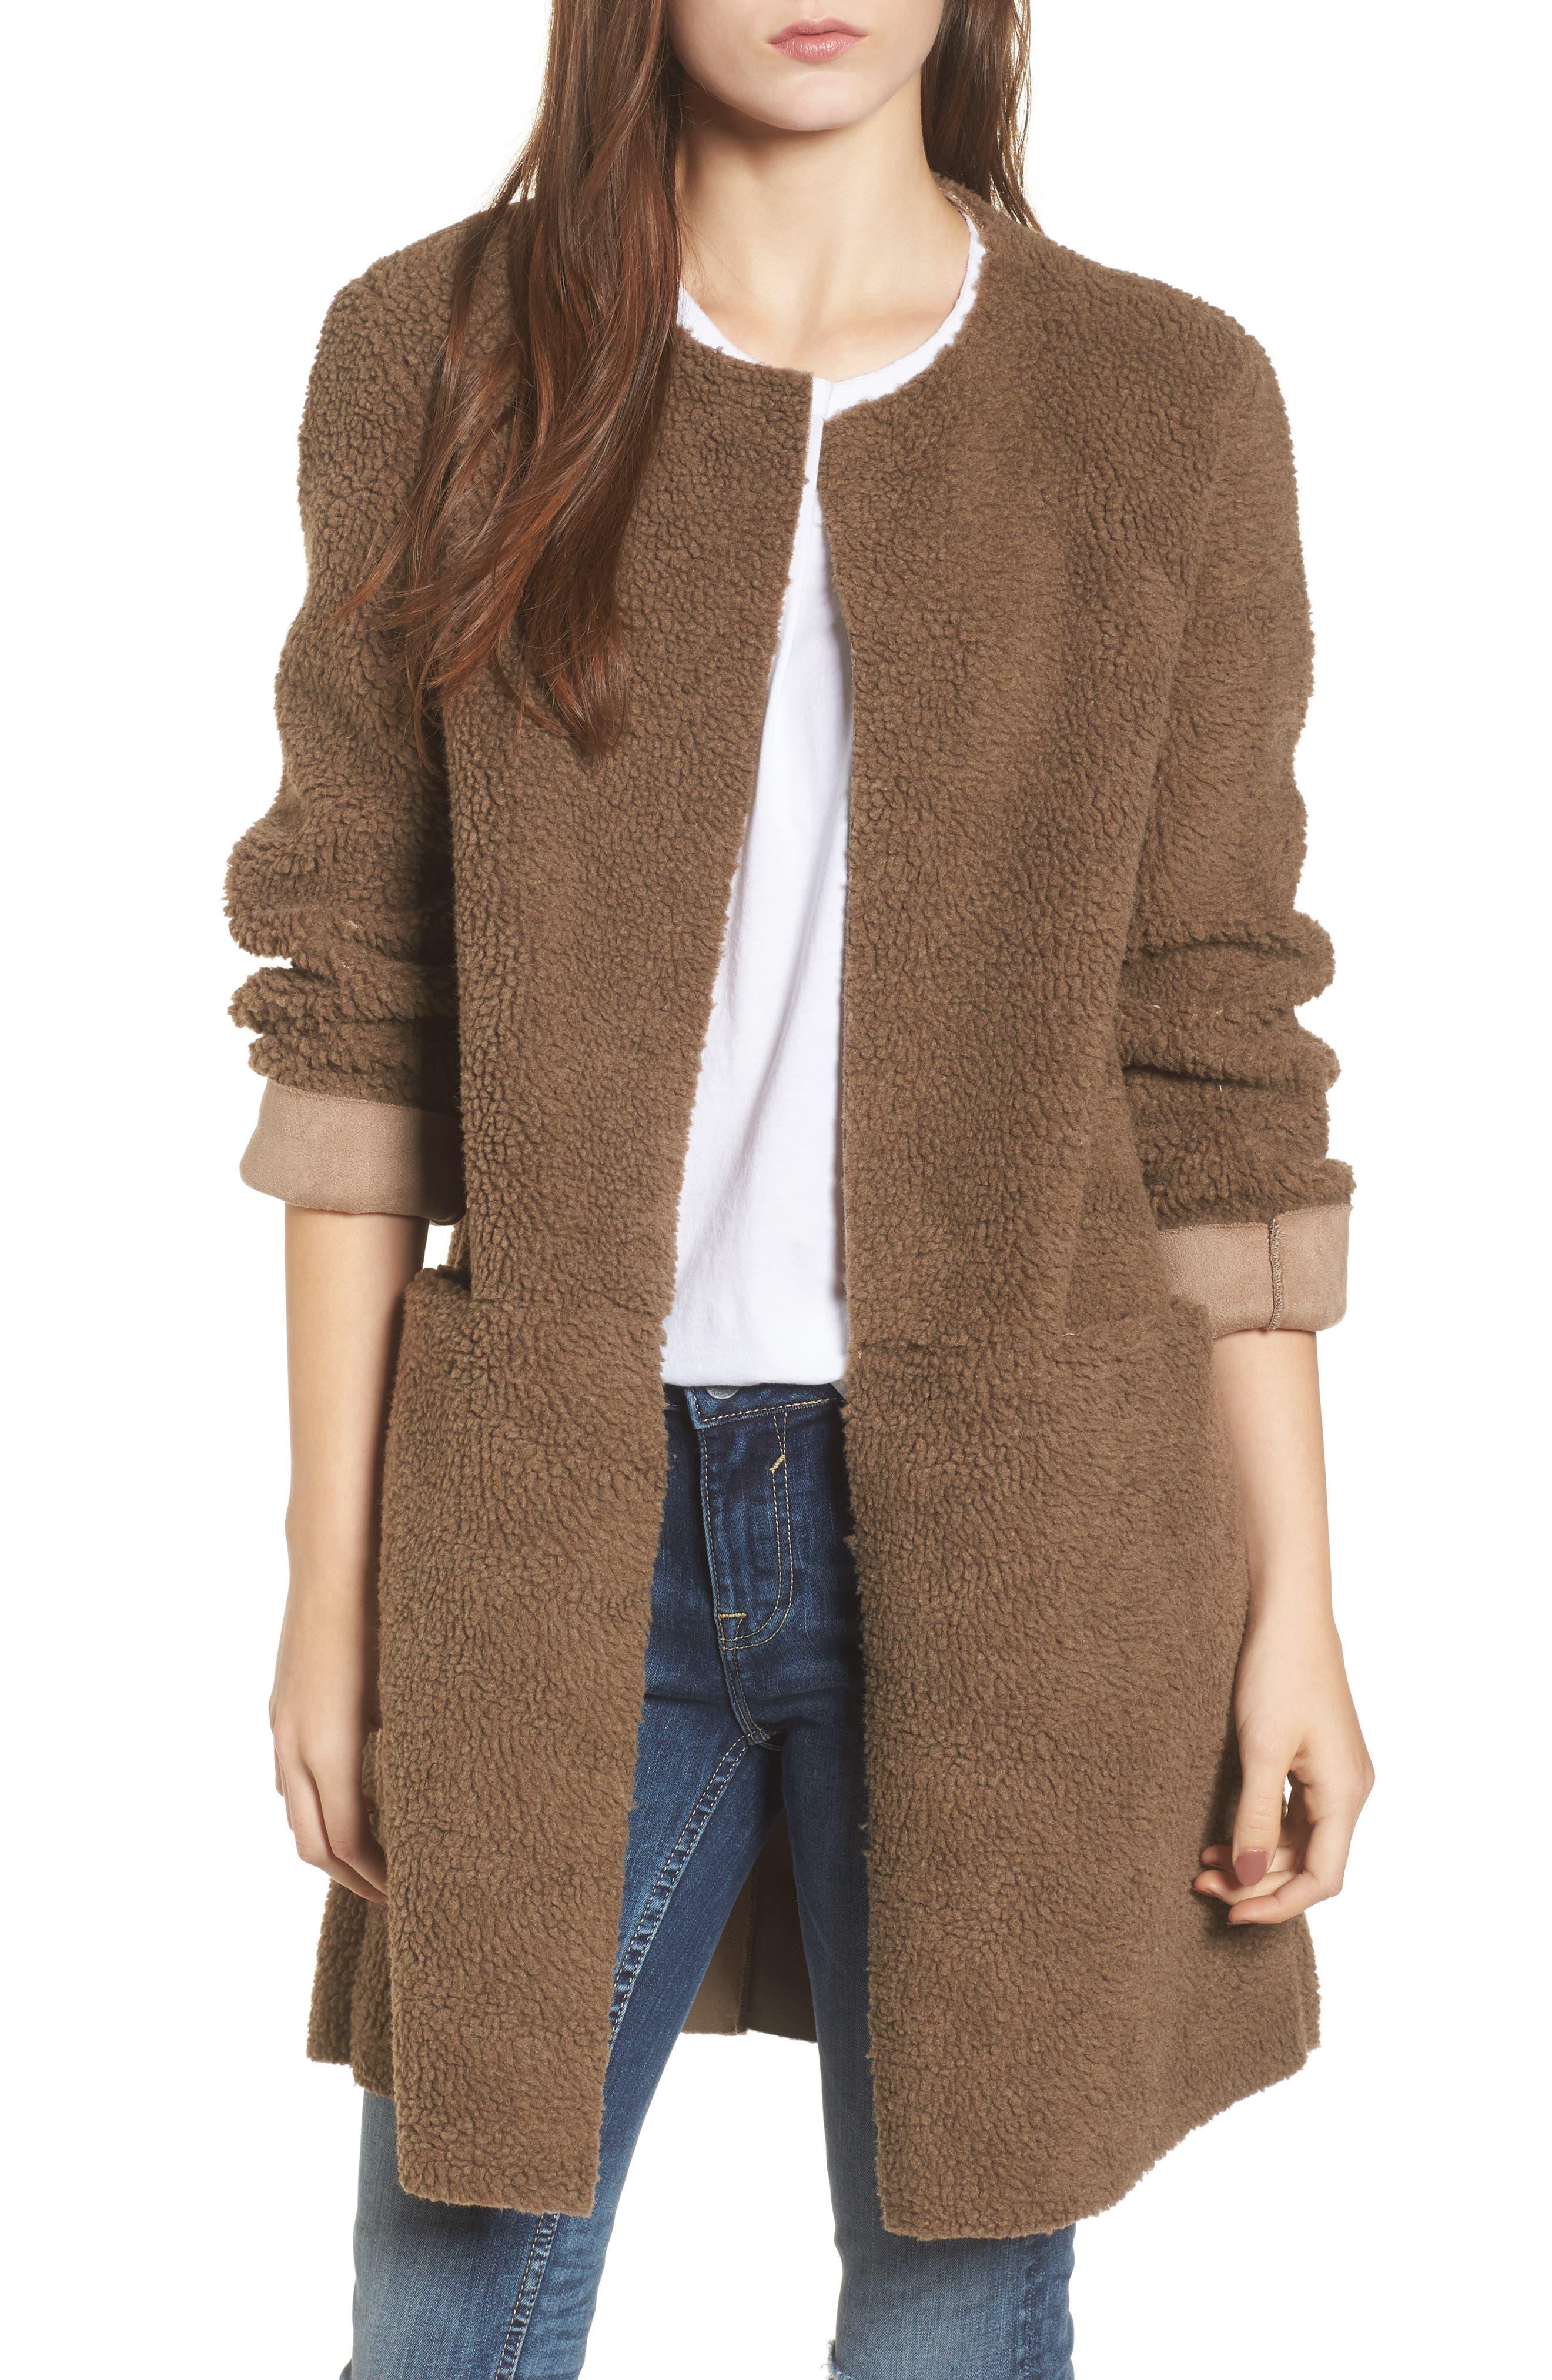 Main Image - EVIDNT Reversible Fleece Jacket